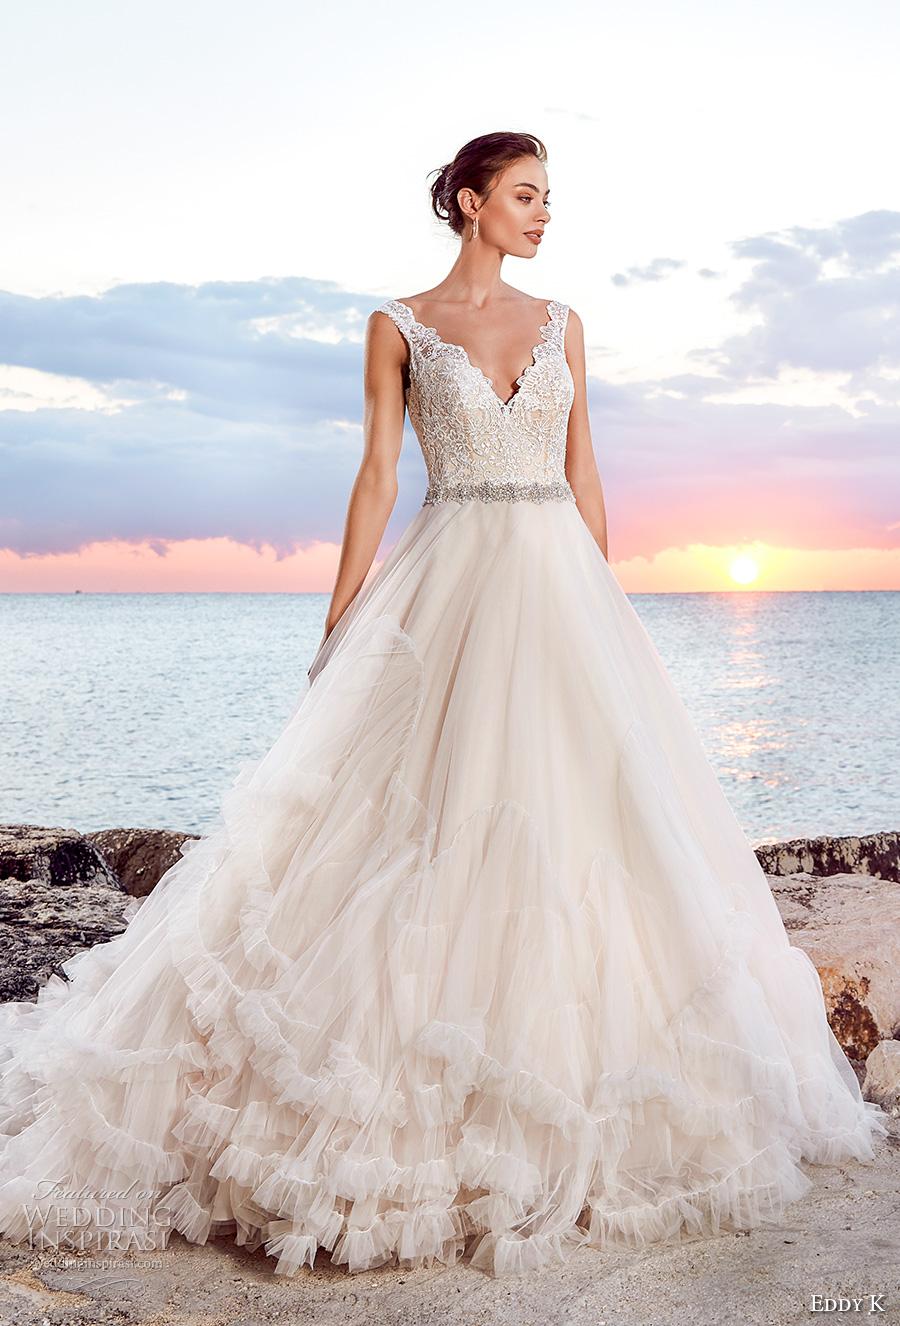 2018 wedding dresses photo - 1